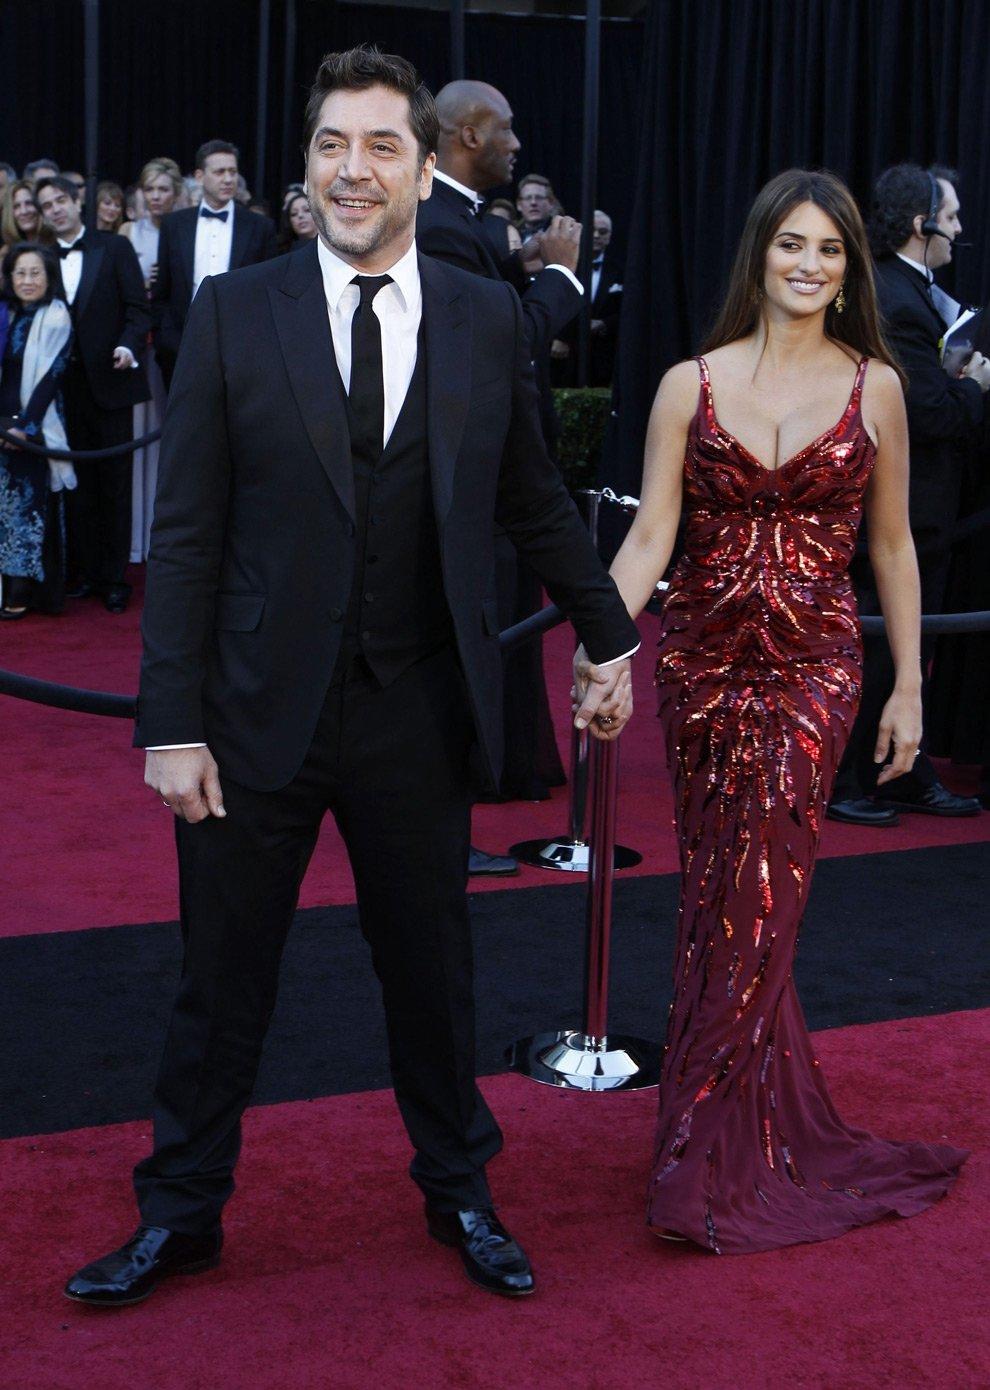 Испанский актер Хавьер Бардем и его жена, актриса Пенелопа Круз